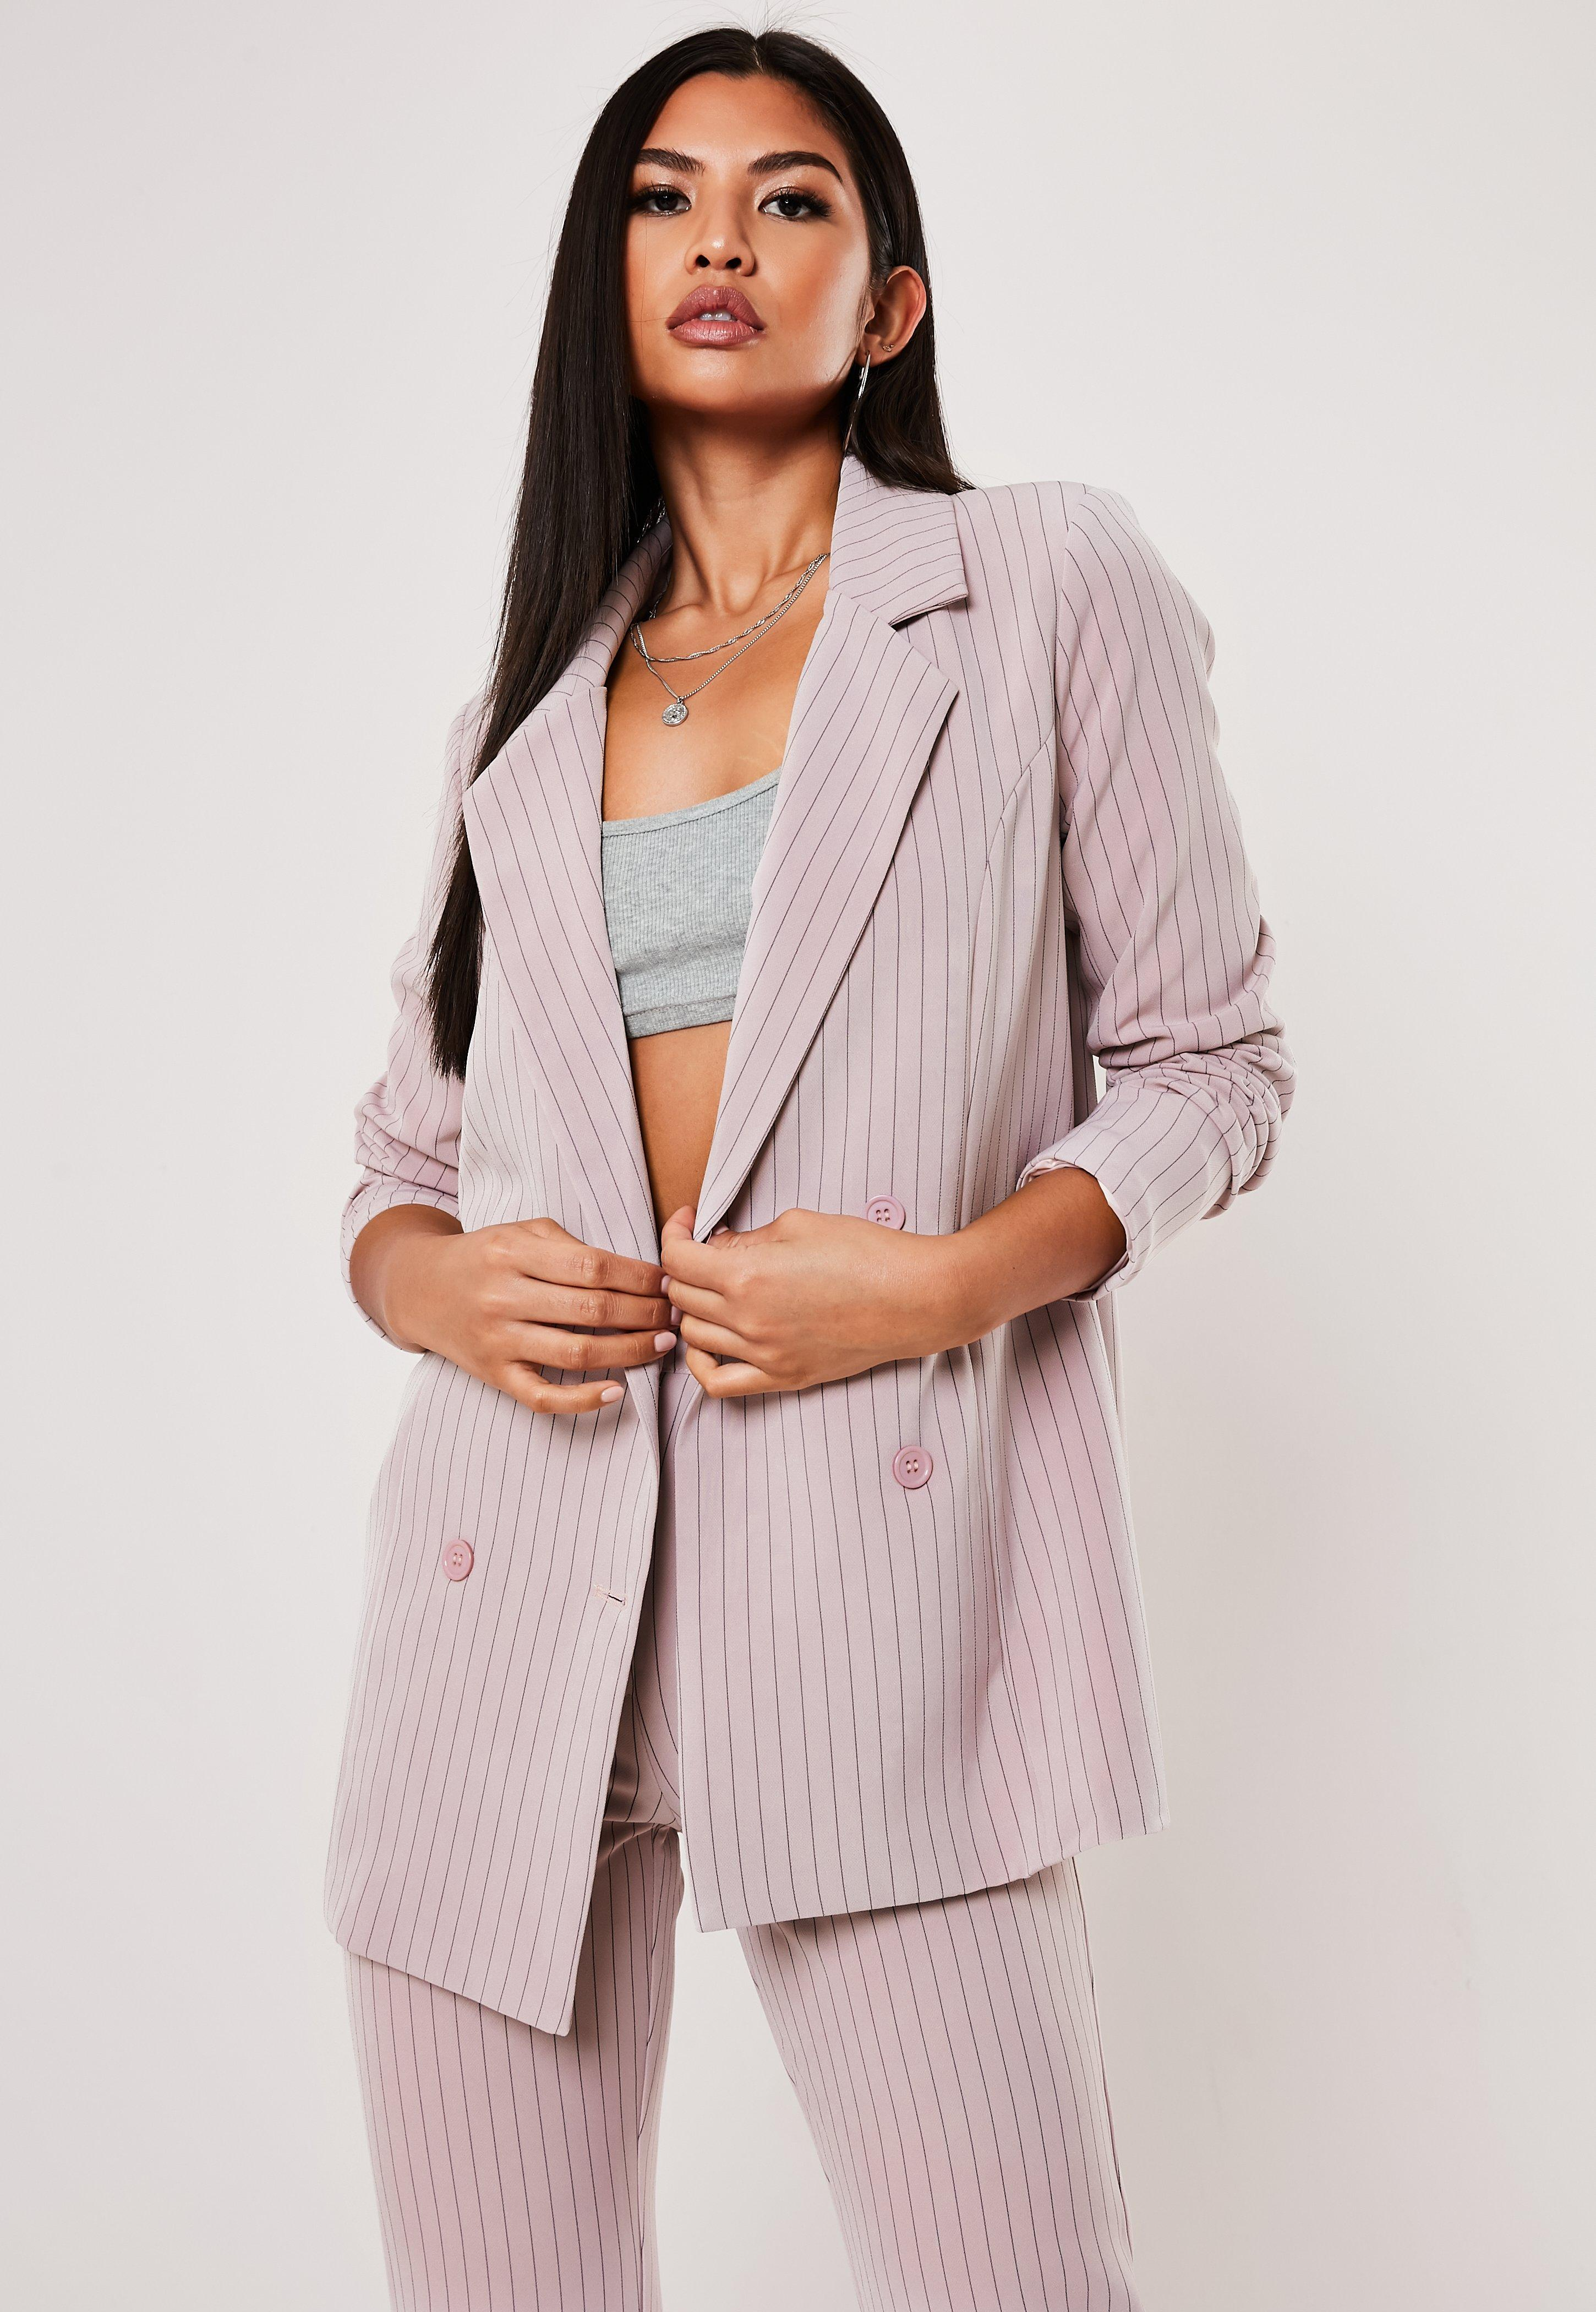 1b6aea8e Blazers for Women - Shop Smart & Tweed Blazers UK - Missguided